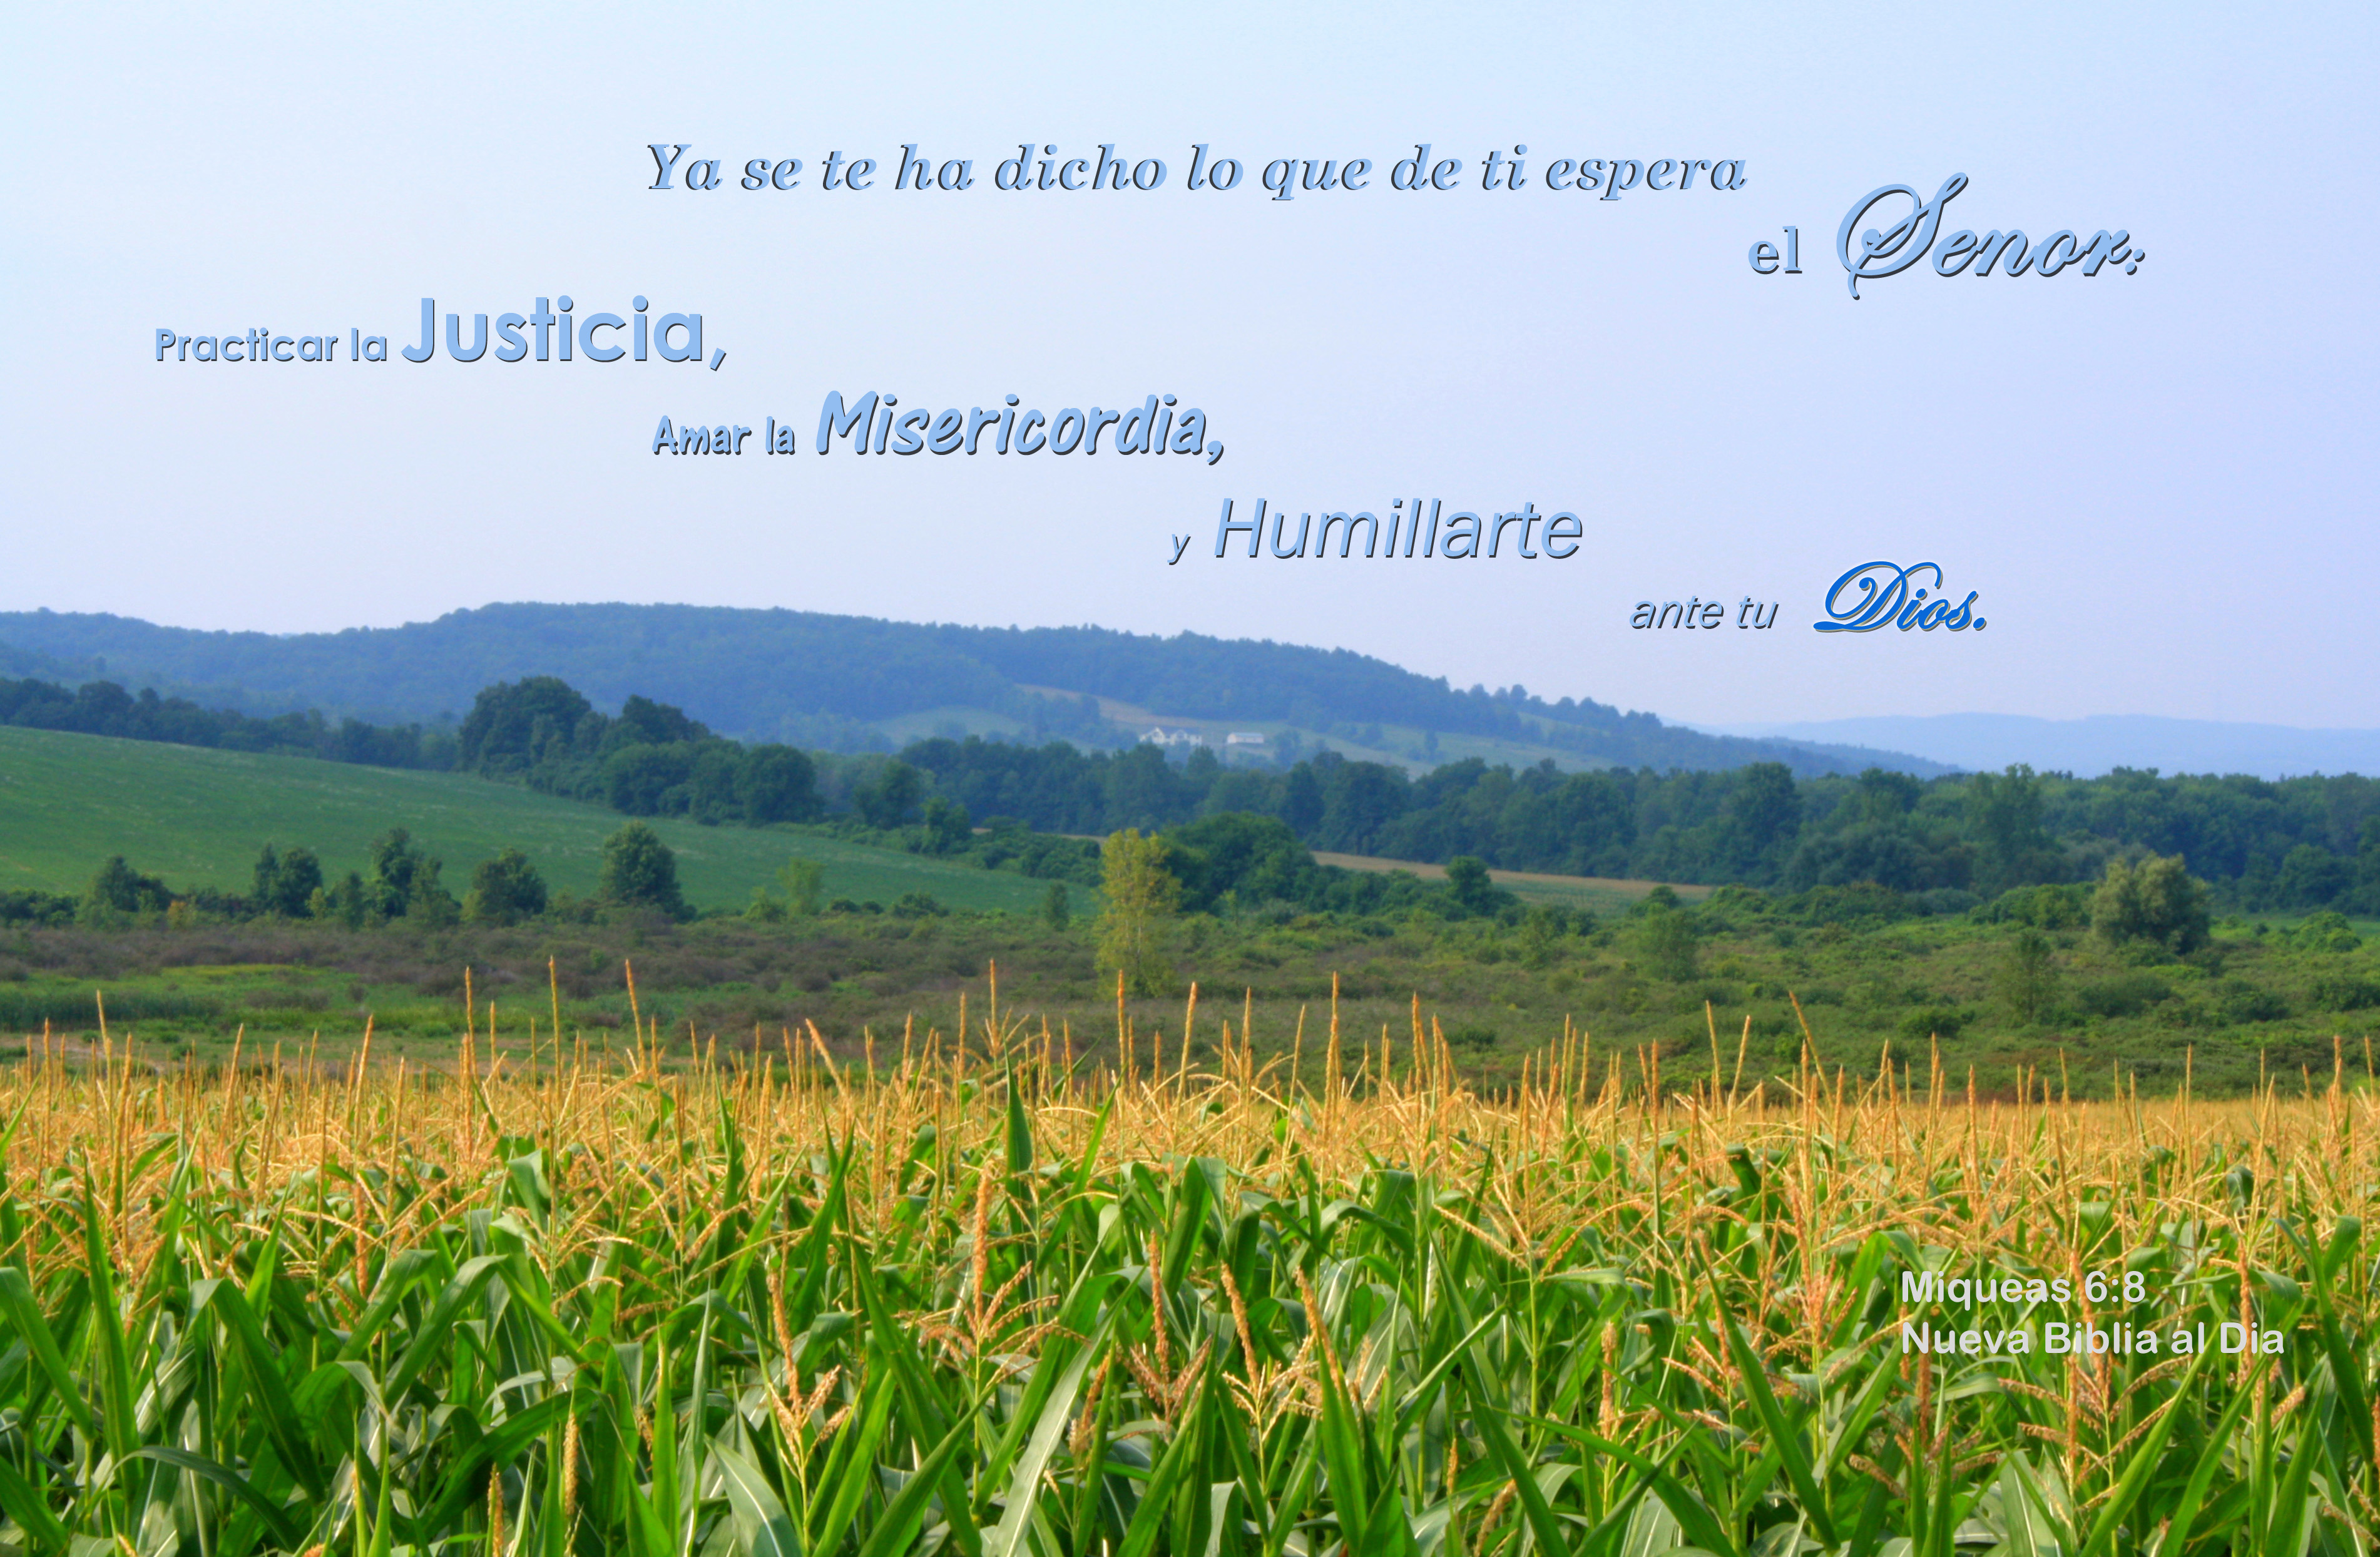 Humillarte Ante tu Dios, Bible, Corn, Cornfield, Fall, HQ Photo